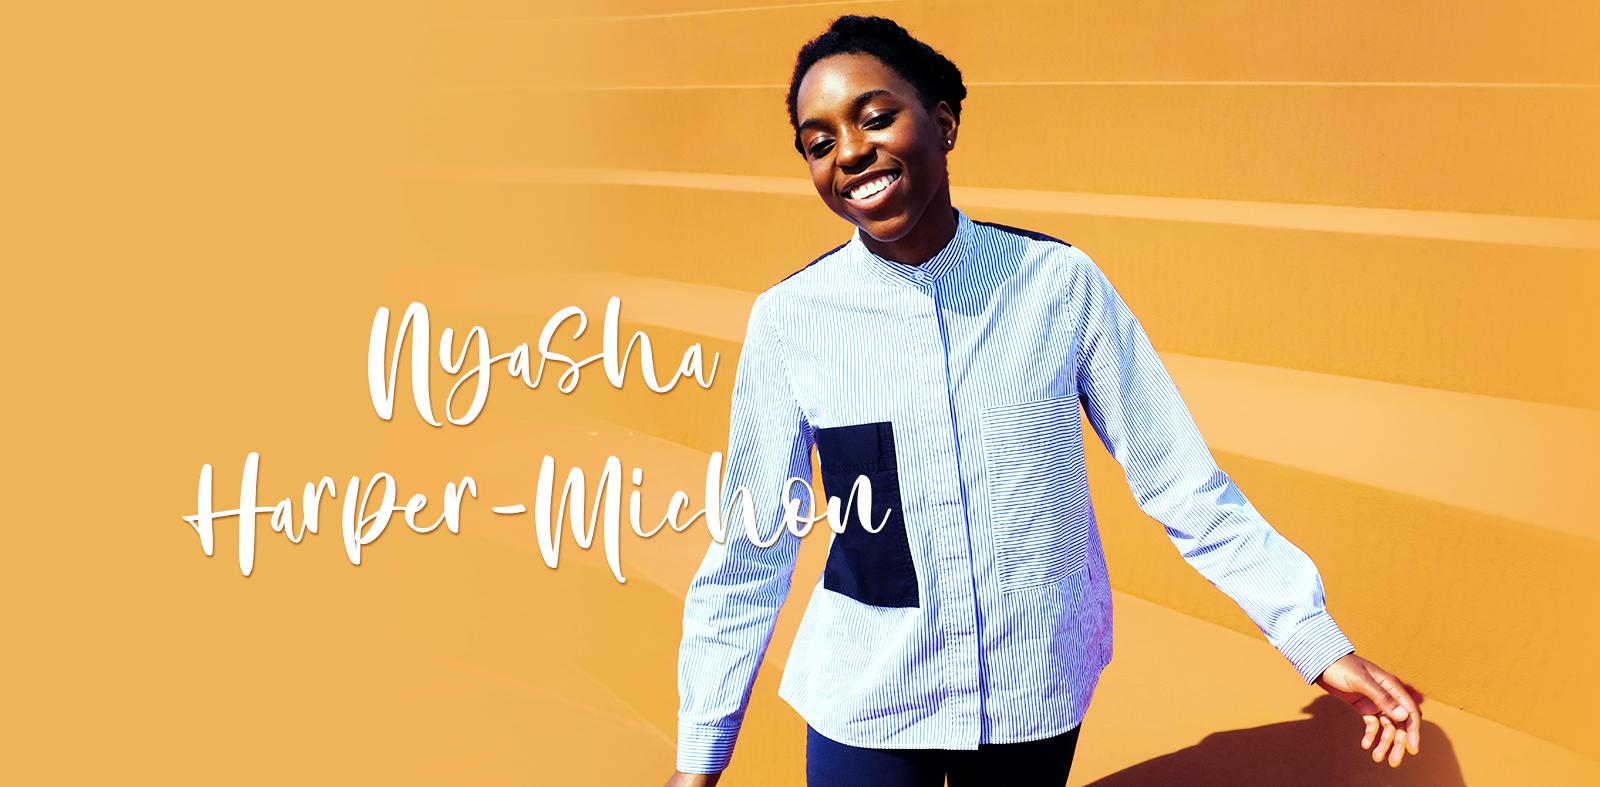 Nyasha Harper-Michon photo by Philippe Sarfati